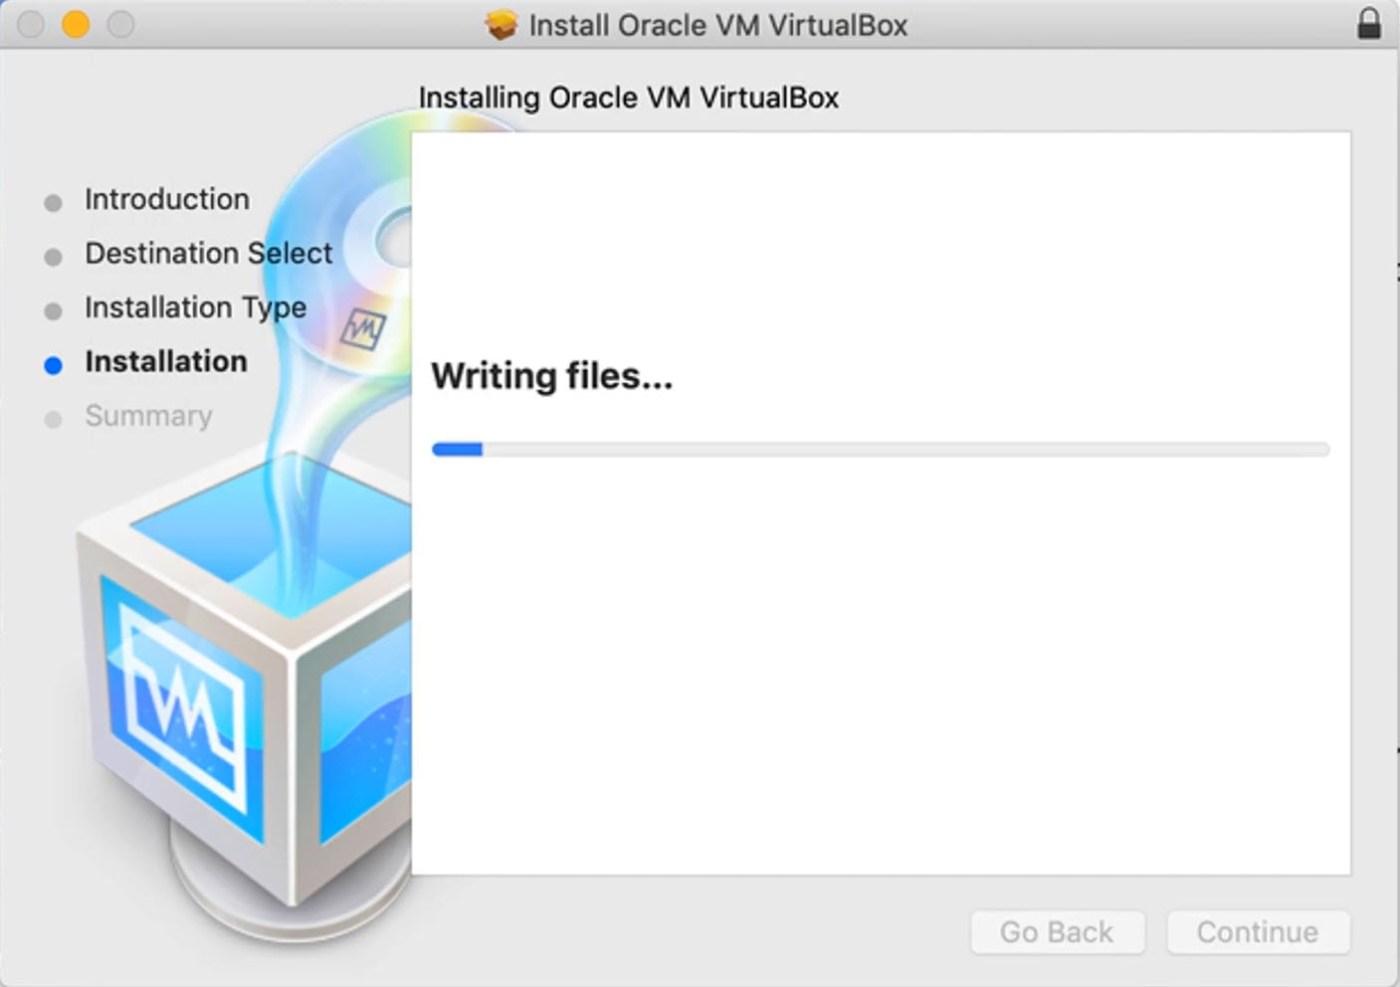 Installing VM Oracle VirtualBox